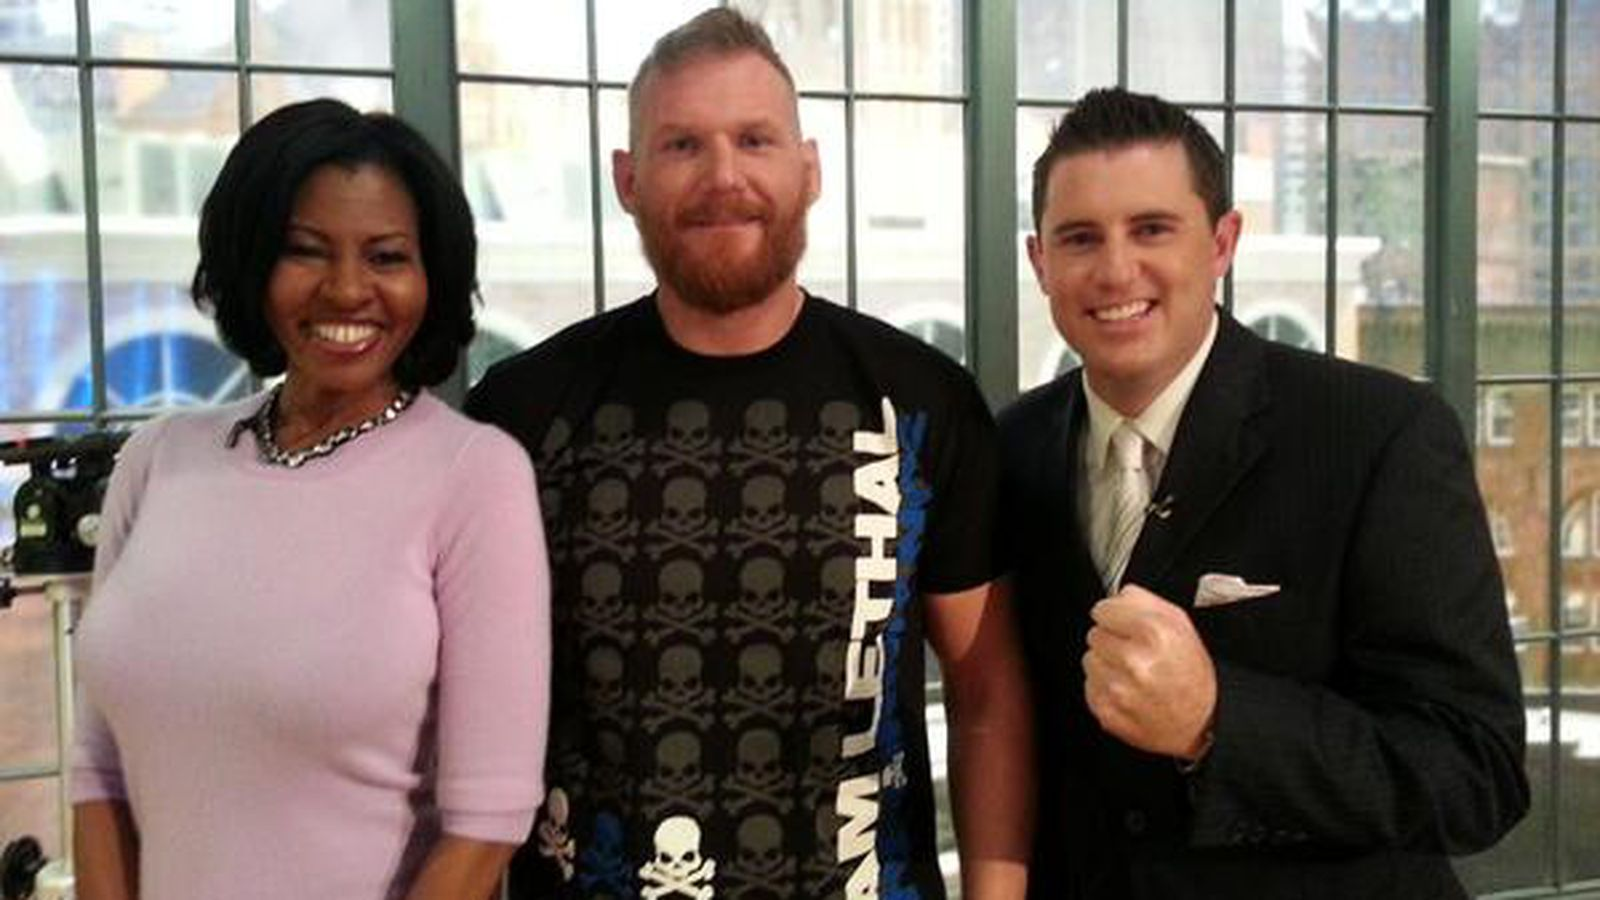 UFC 164 video: Smooth-talking Josh Barnett dazzles FOX news